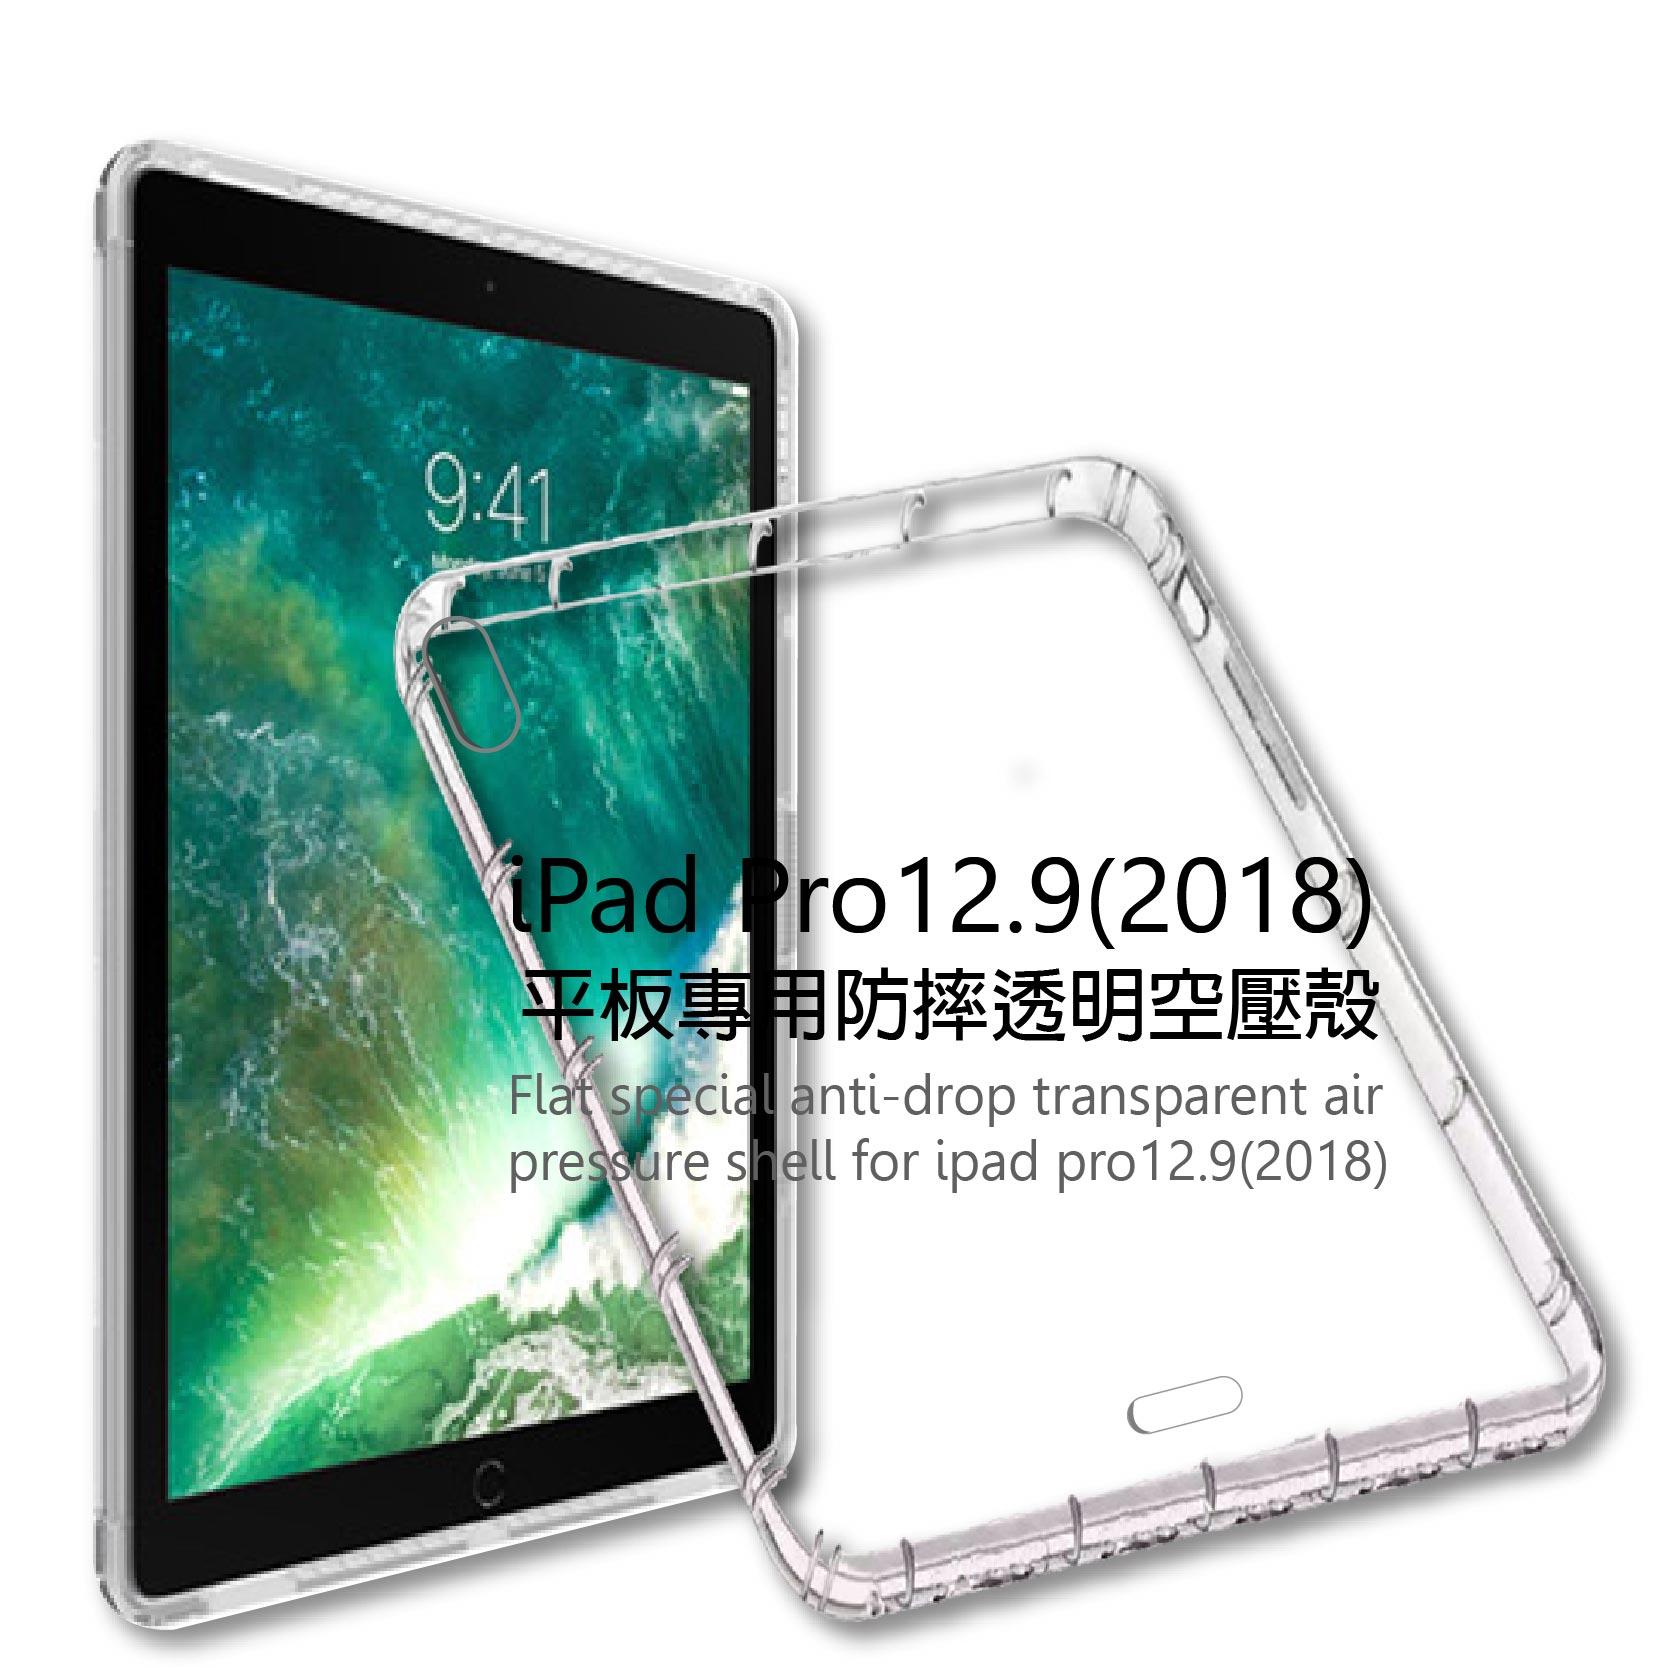 iPad Pro 12.9吋(2018) A1876 A2014 A1895 APPLE 平板空壓殼 氣墊保護套 防摔軟殼 TPU透明套 果凍套